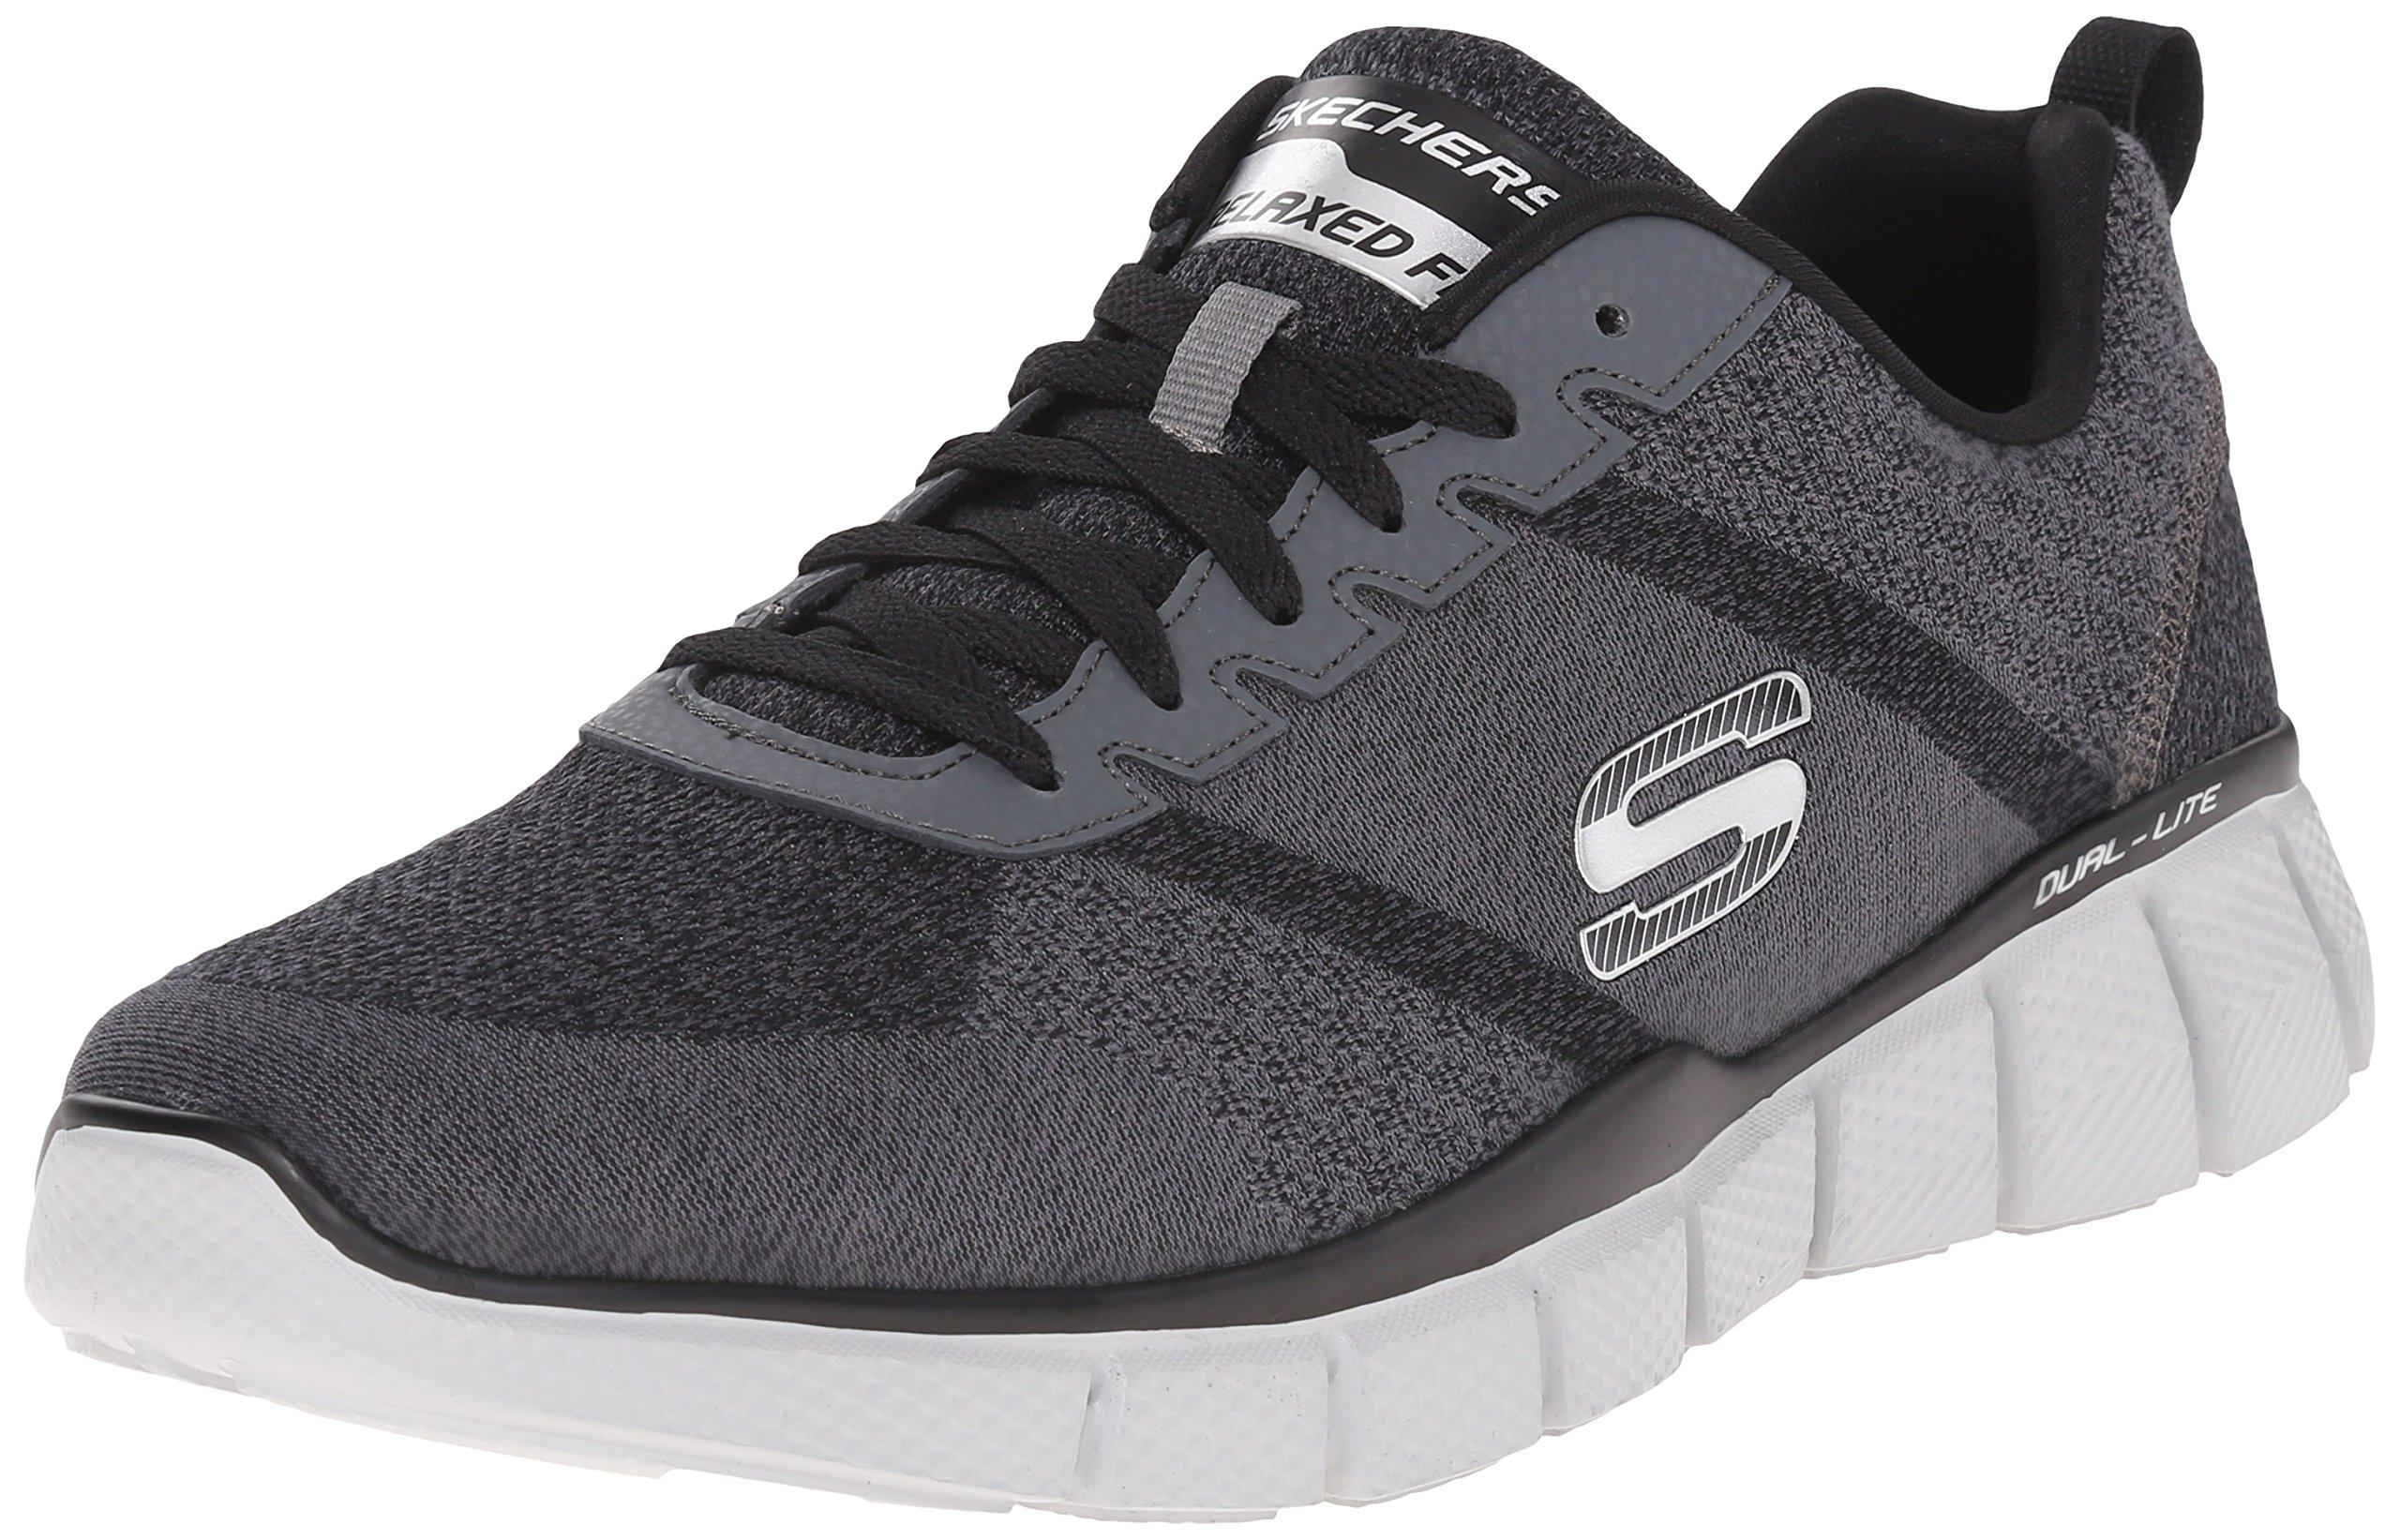 Skechers Sport Men's Equalizer 2.0 True Balance Sneaker,Grey/Black/Charcoal,10.5 4E US